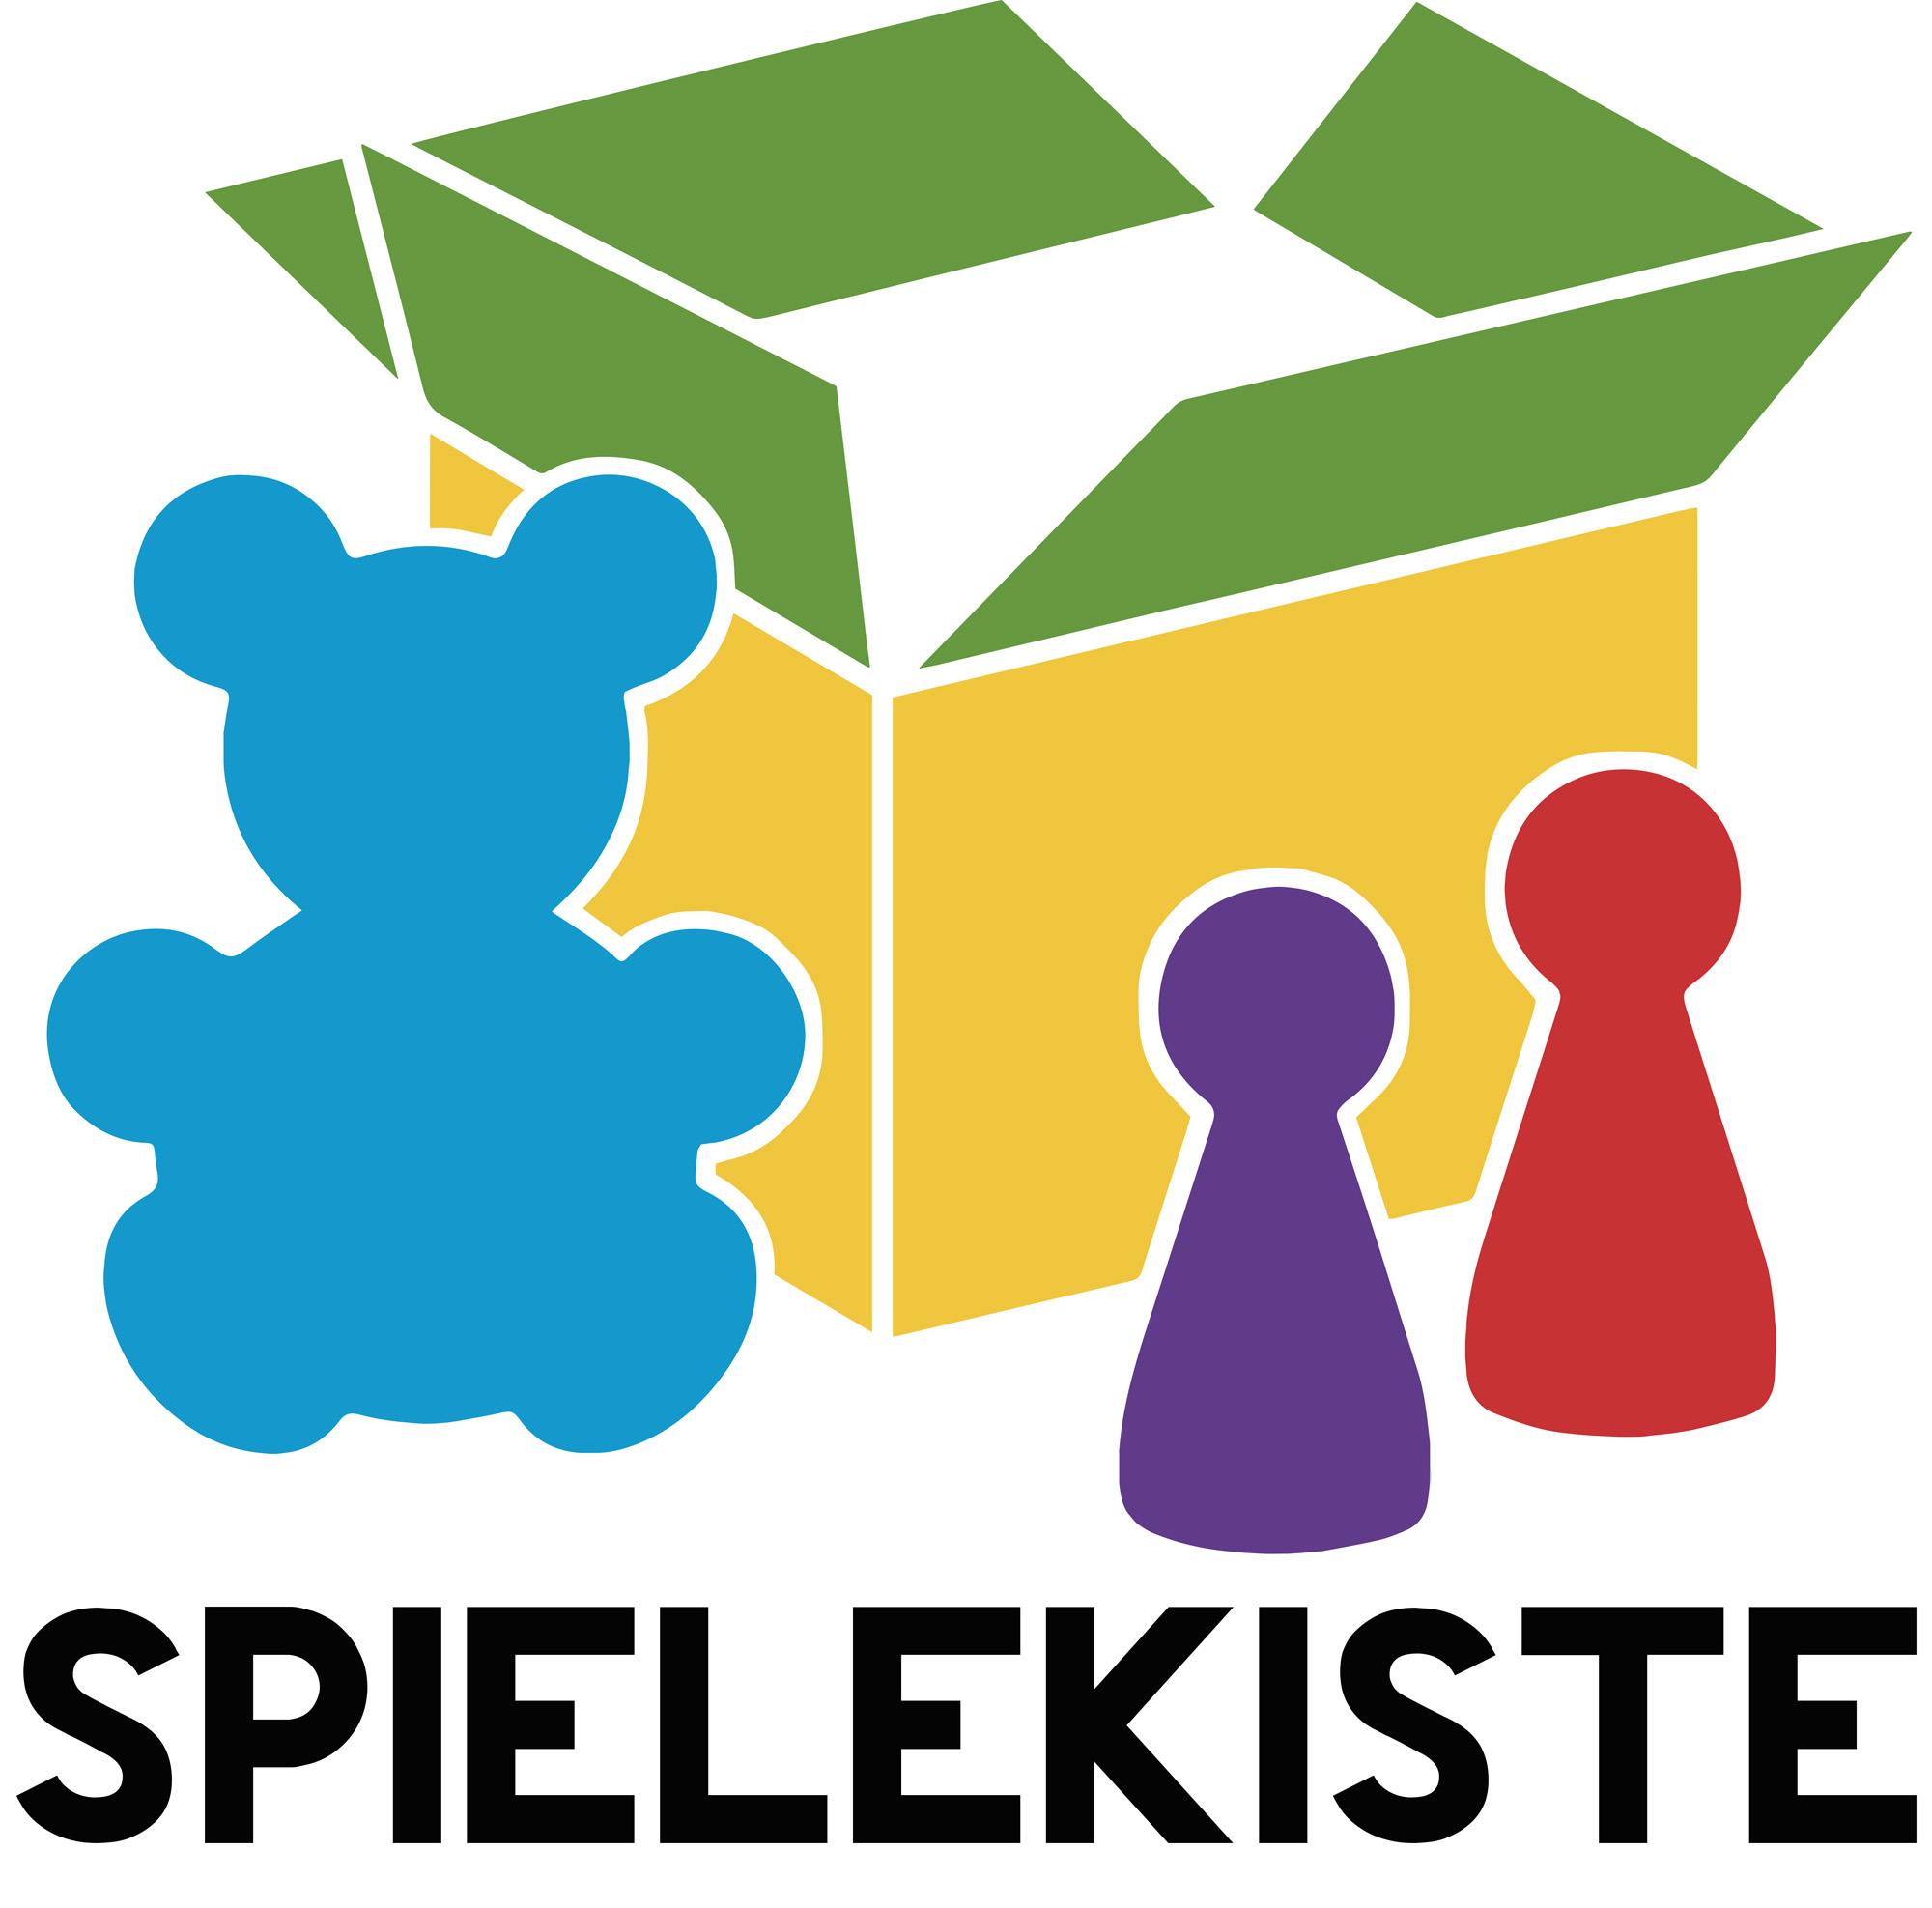 Spielekiste dein Spielzeugladen in in Potsdam Babelsberg